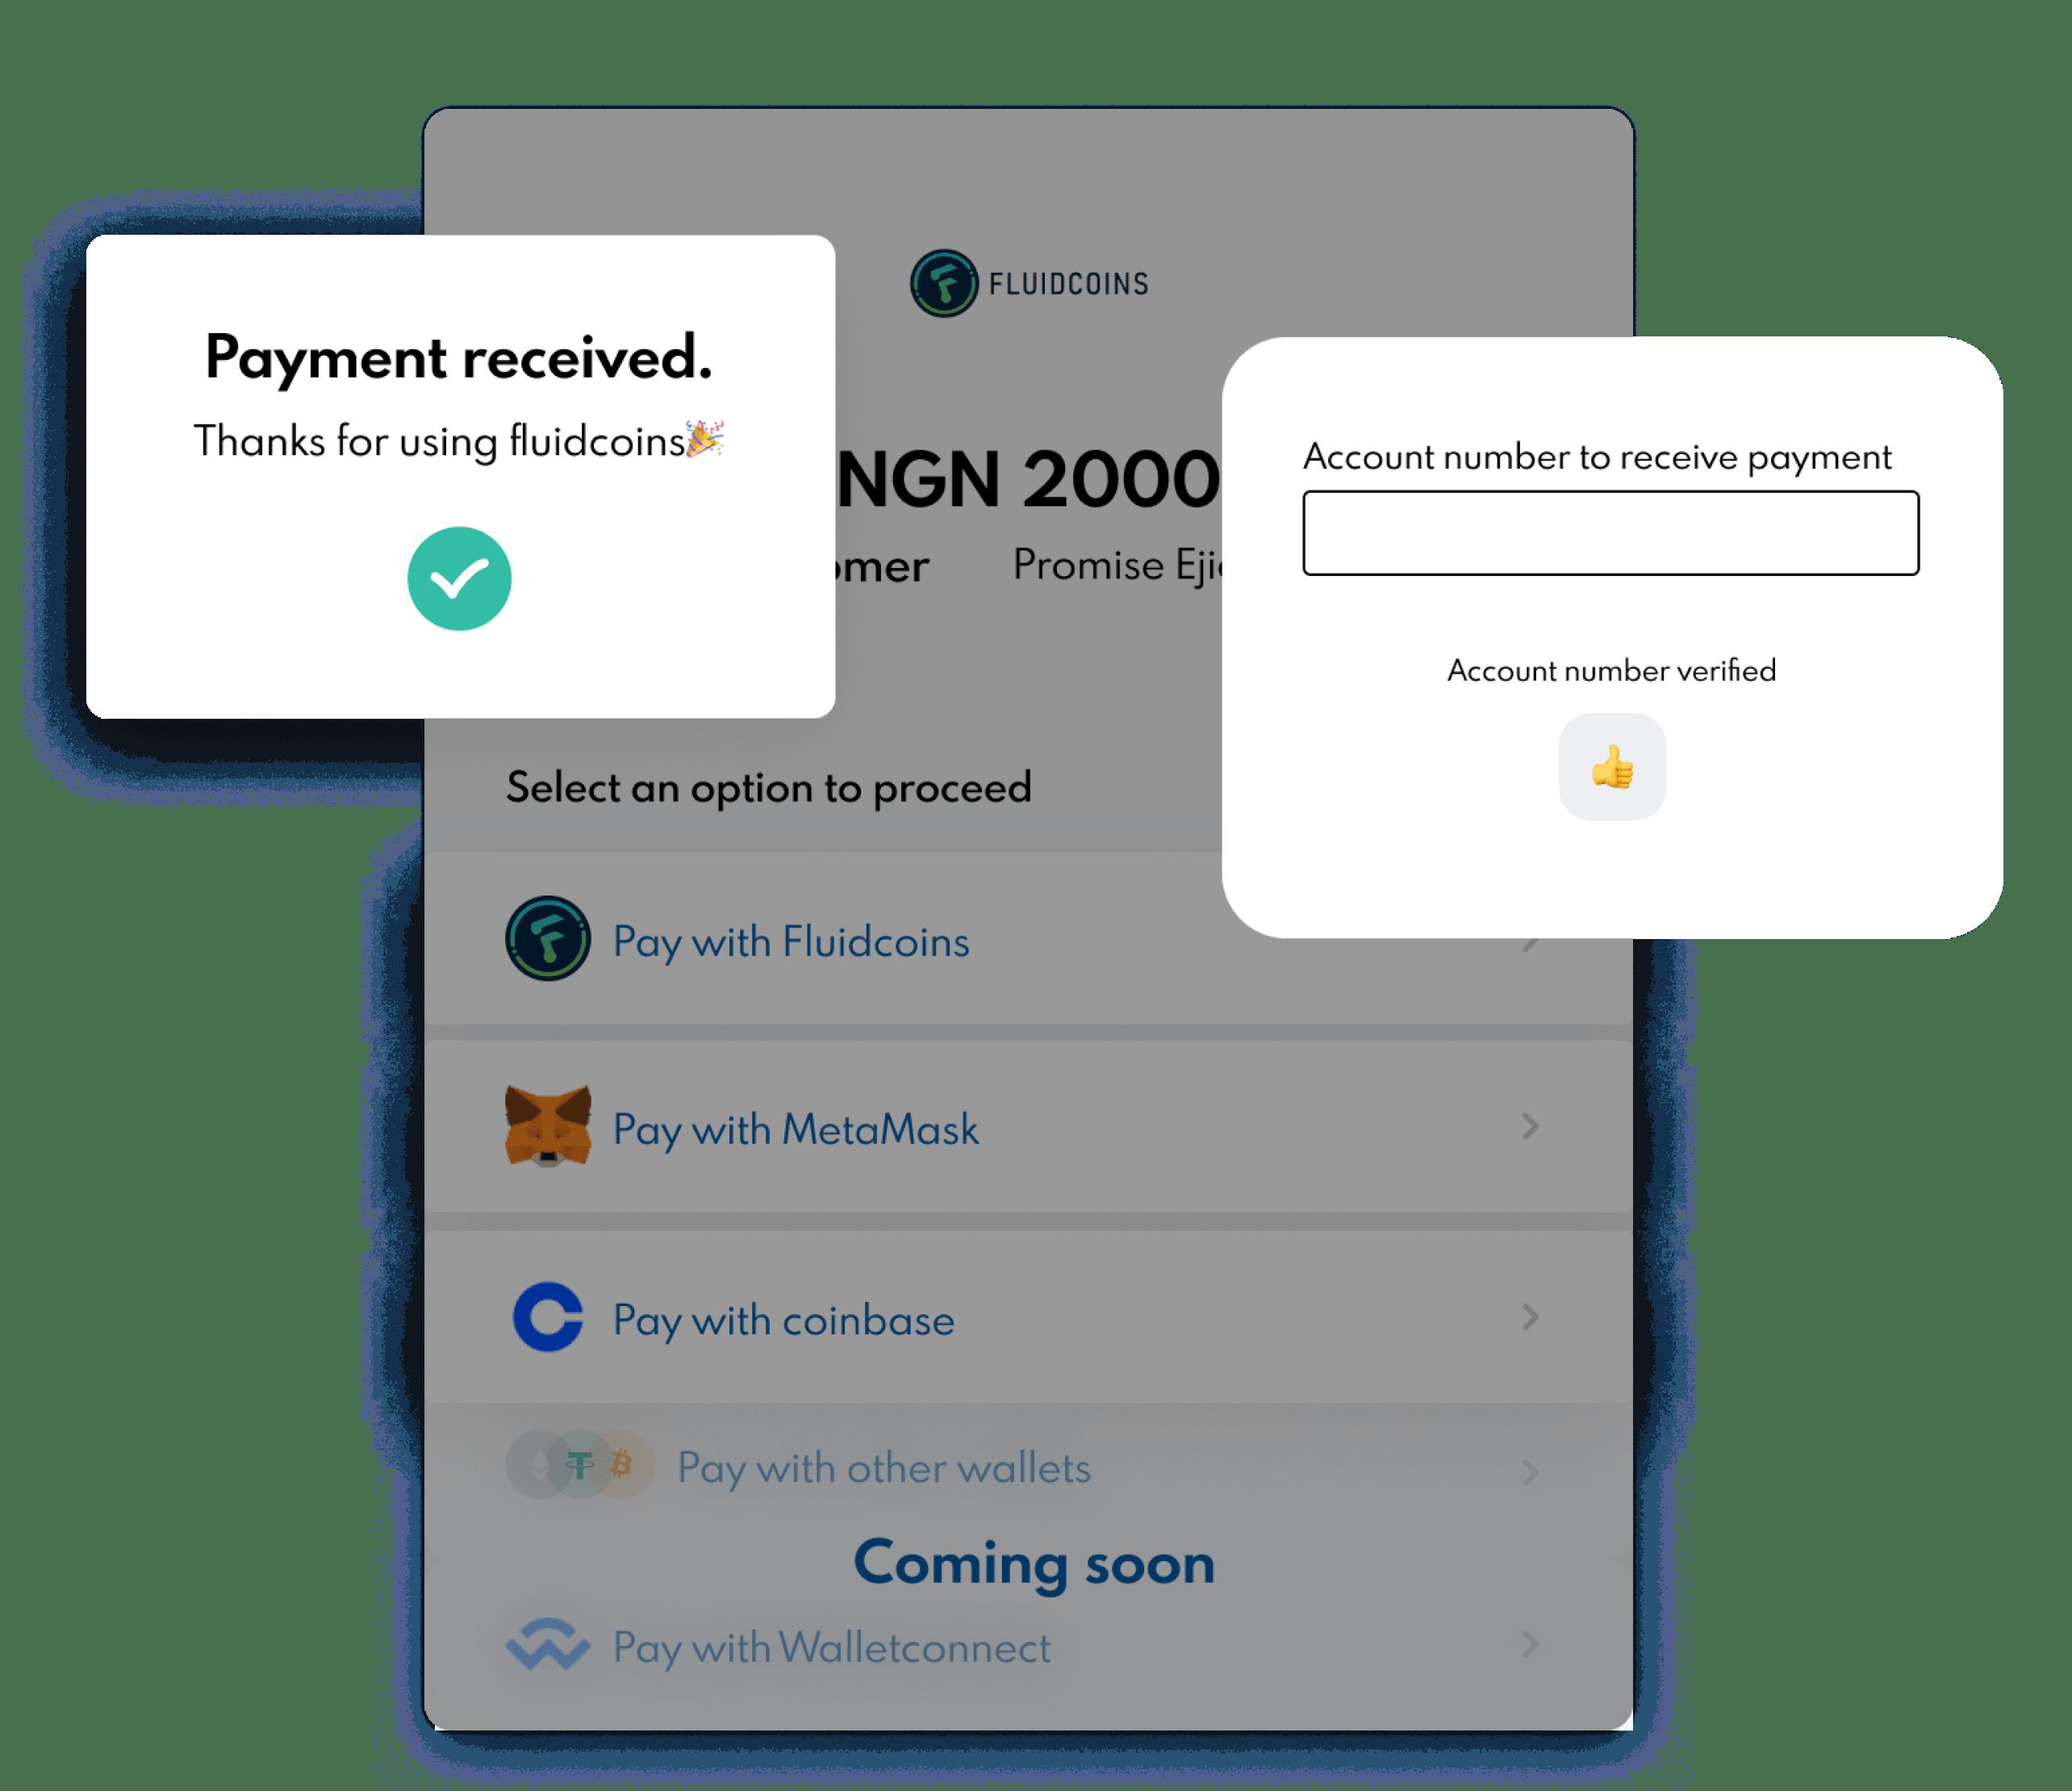 payment recieved